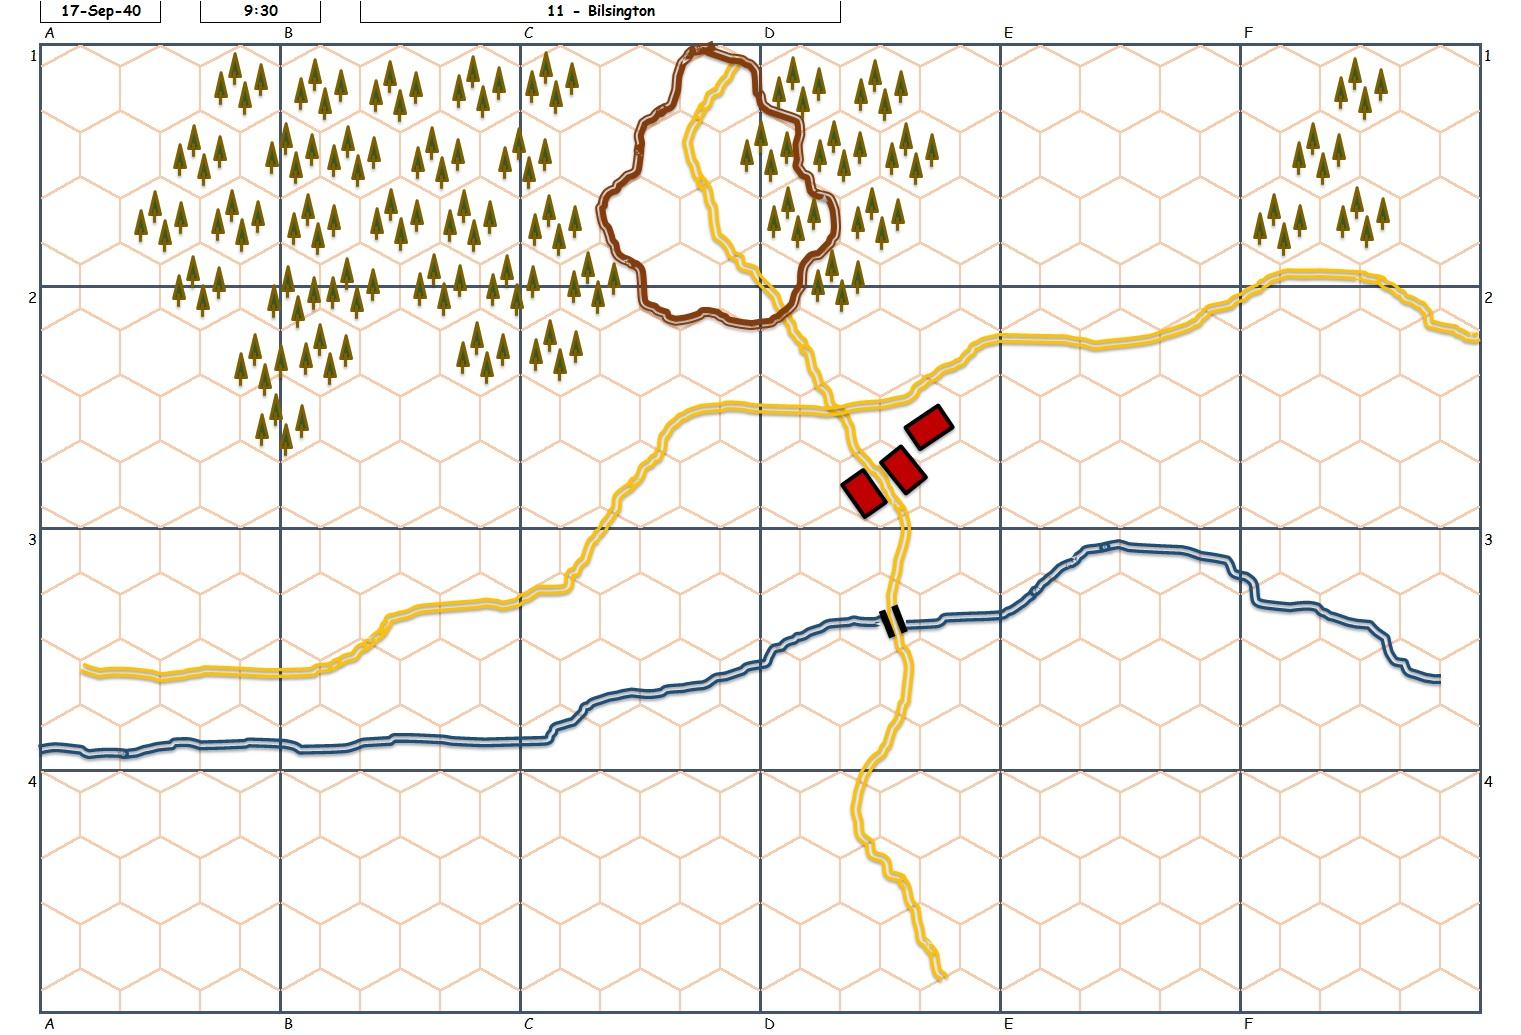 map-11-bilsington-6mm